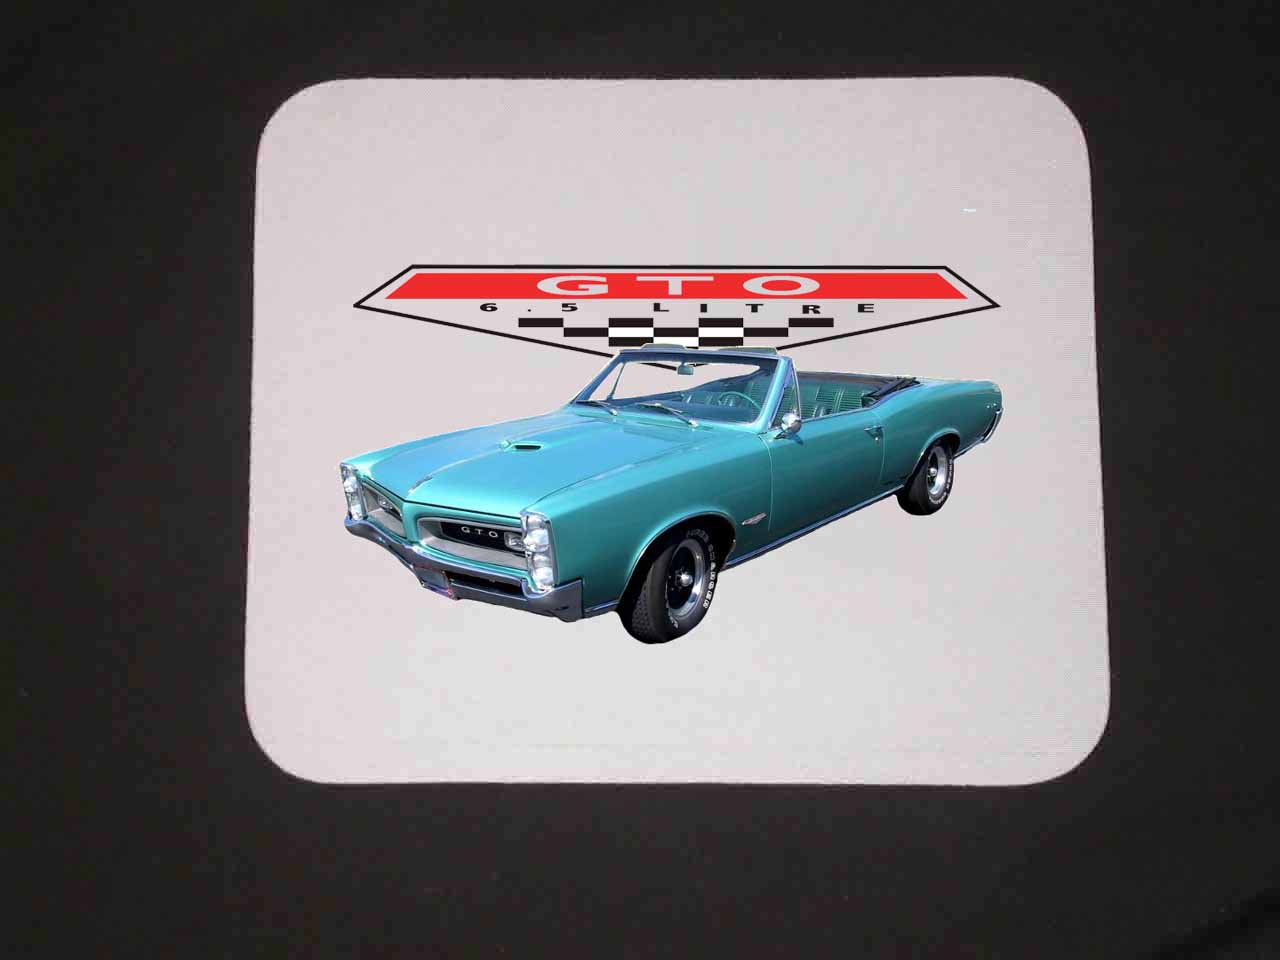 New 1966 Turquoise Pontiac GTO Convertible Mousepad!